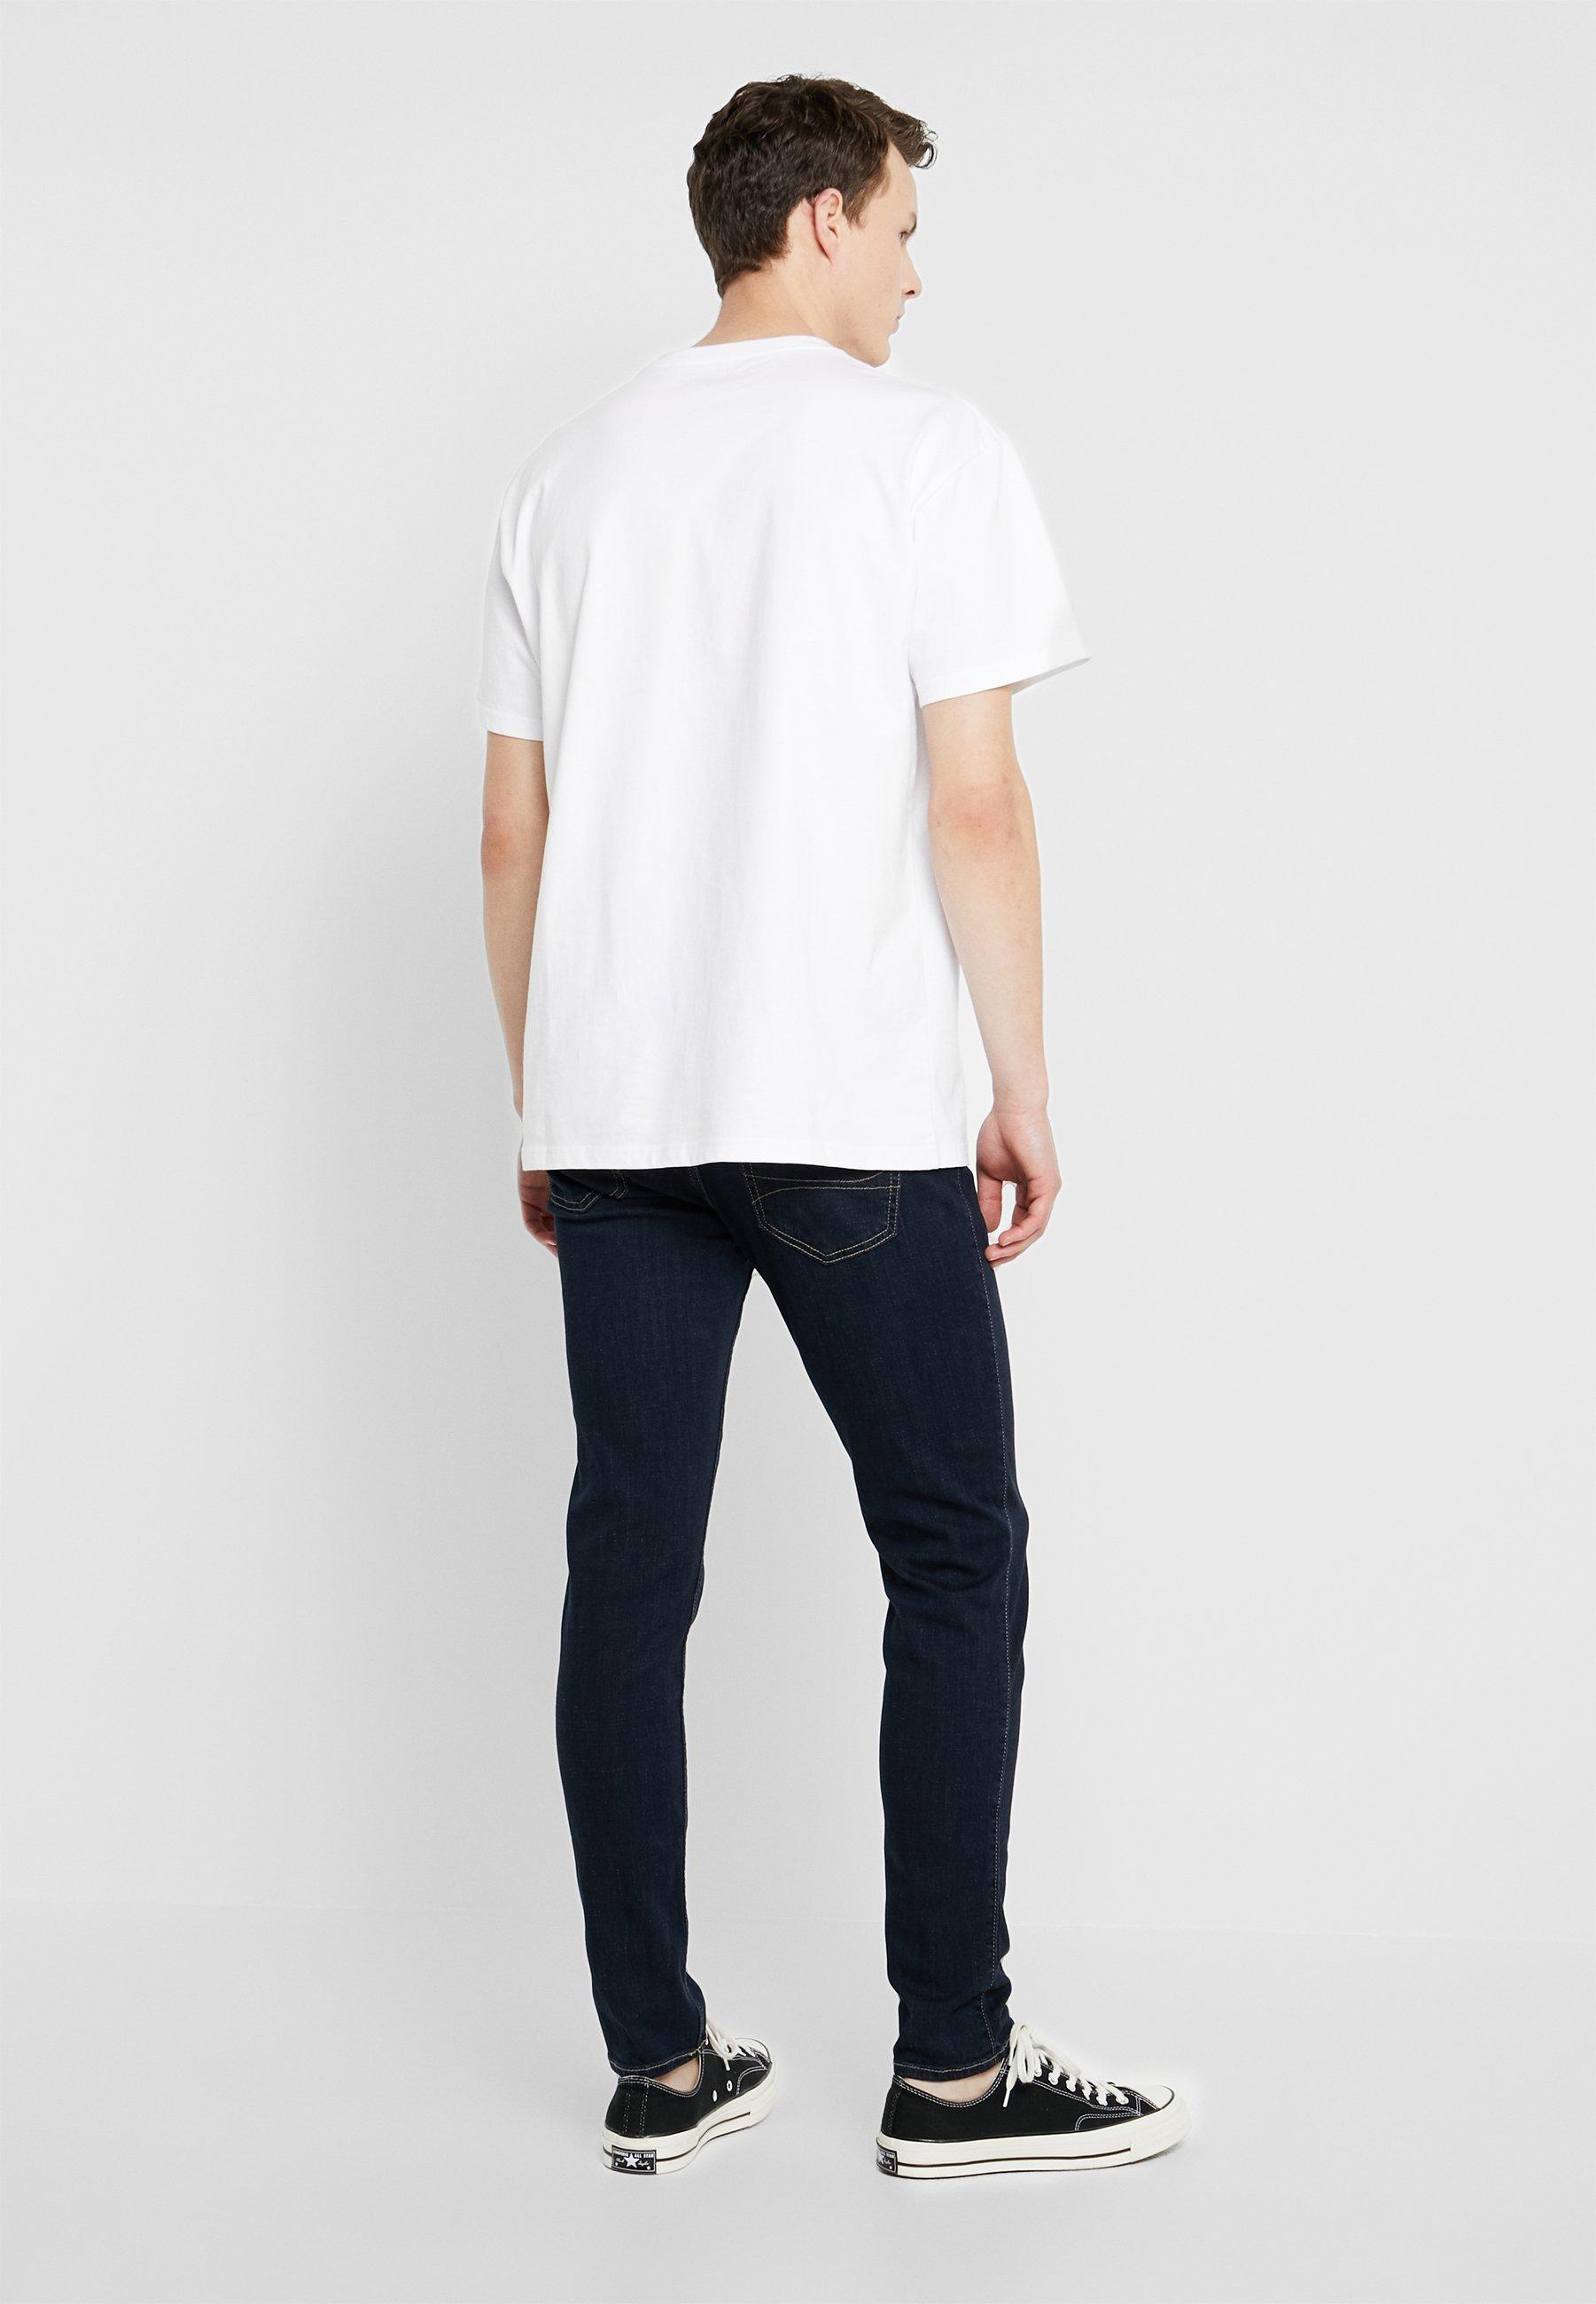 Hollister Skinny Skinny CoJeans Rinse Rinse Skinny CoJeans Hollister Hollister CoJeans Fit Fit Yyb7g6f